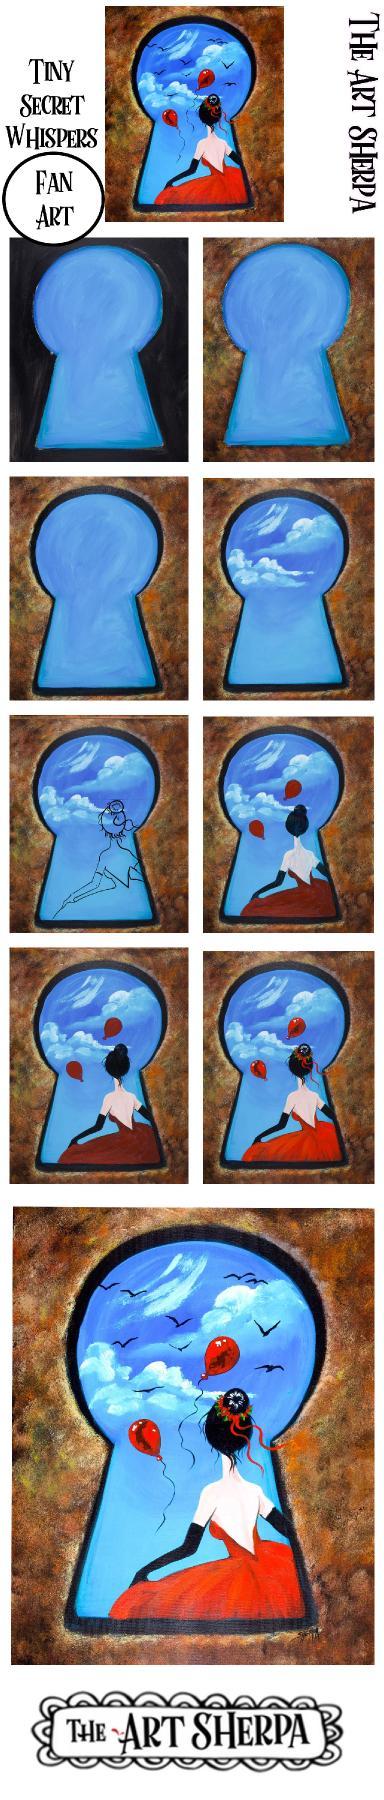 Easy Tiny Secret Whispers   Fan Art  Step by step Acrylic Tutorial  | TheArtSherpa